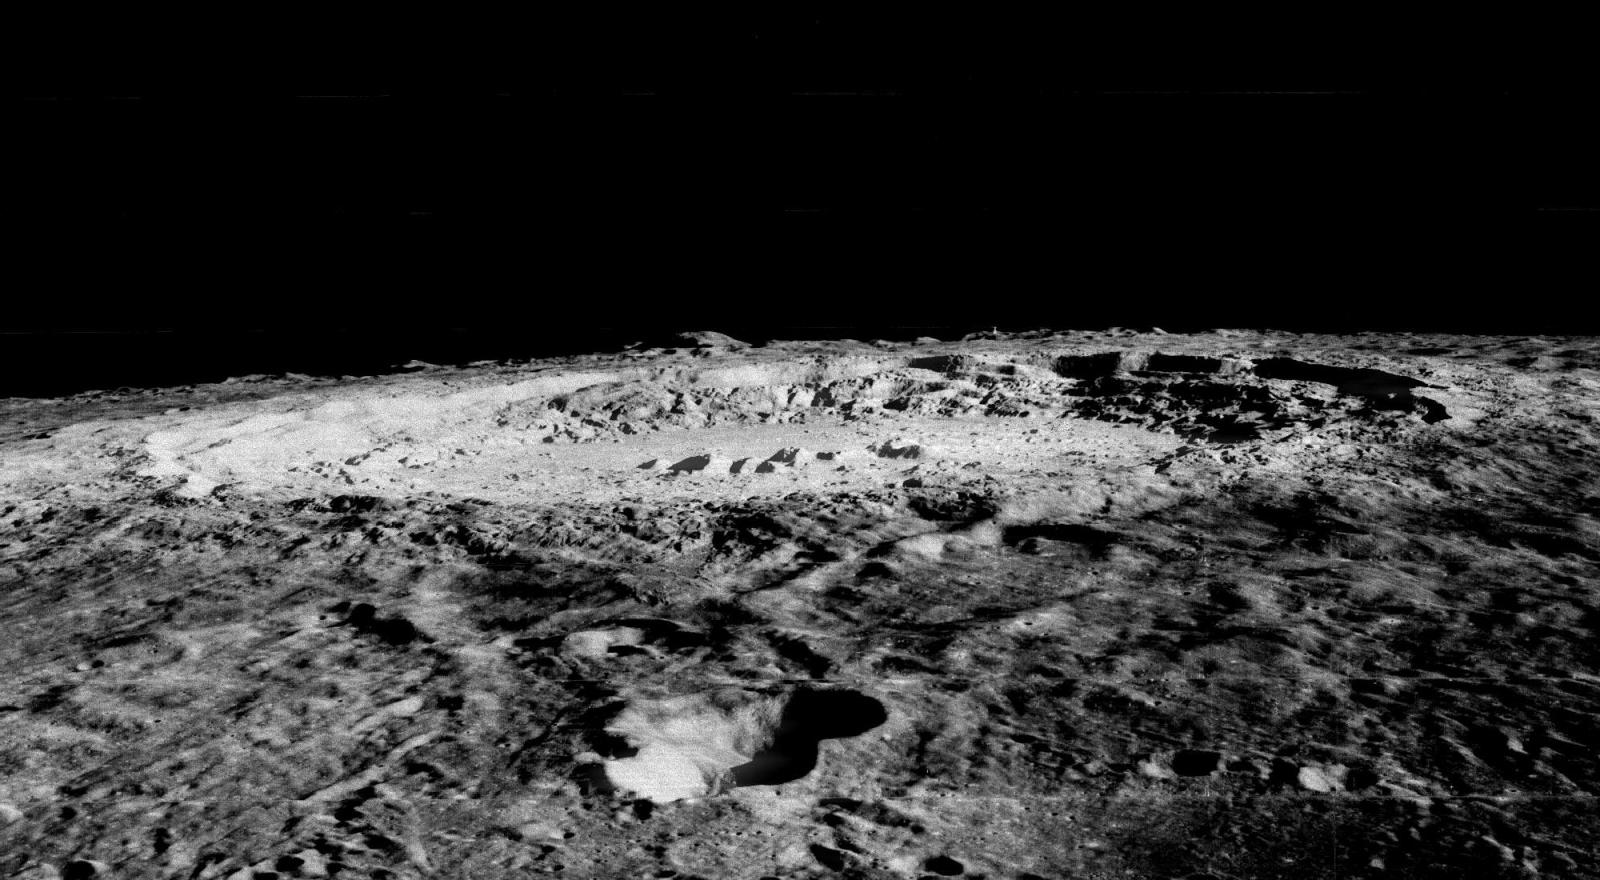 Lunar impact crater